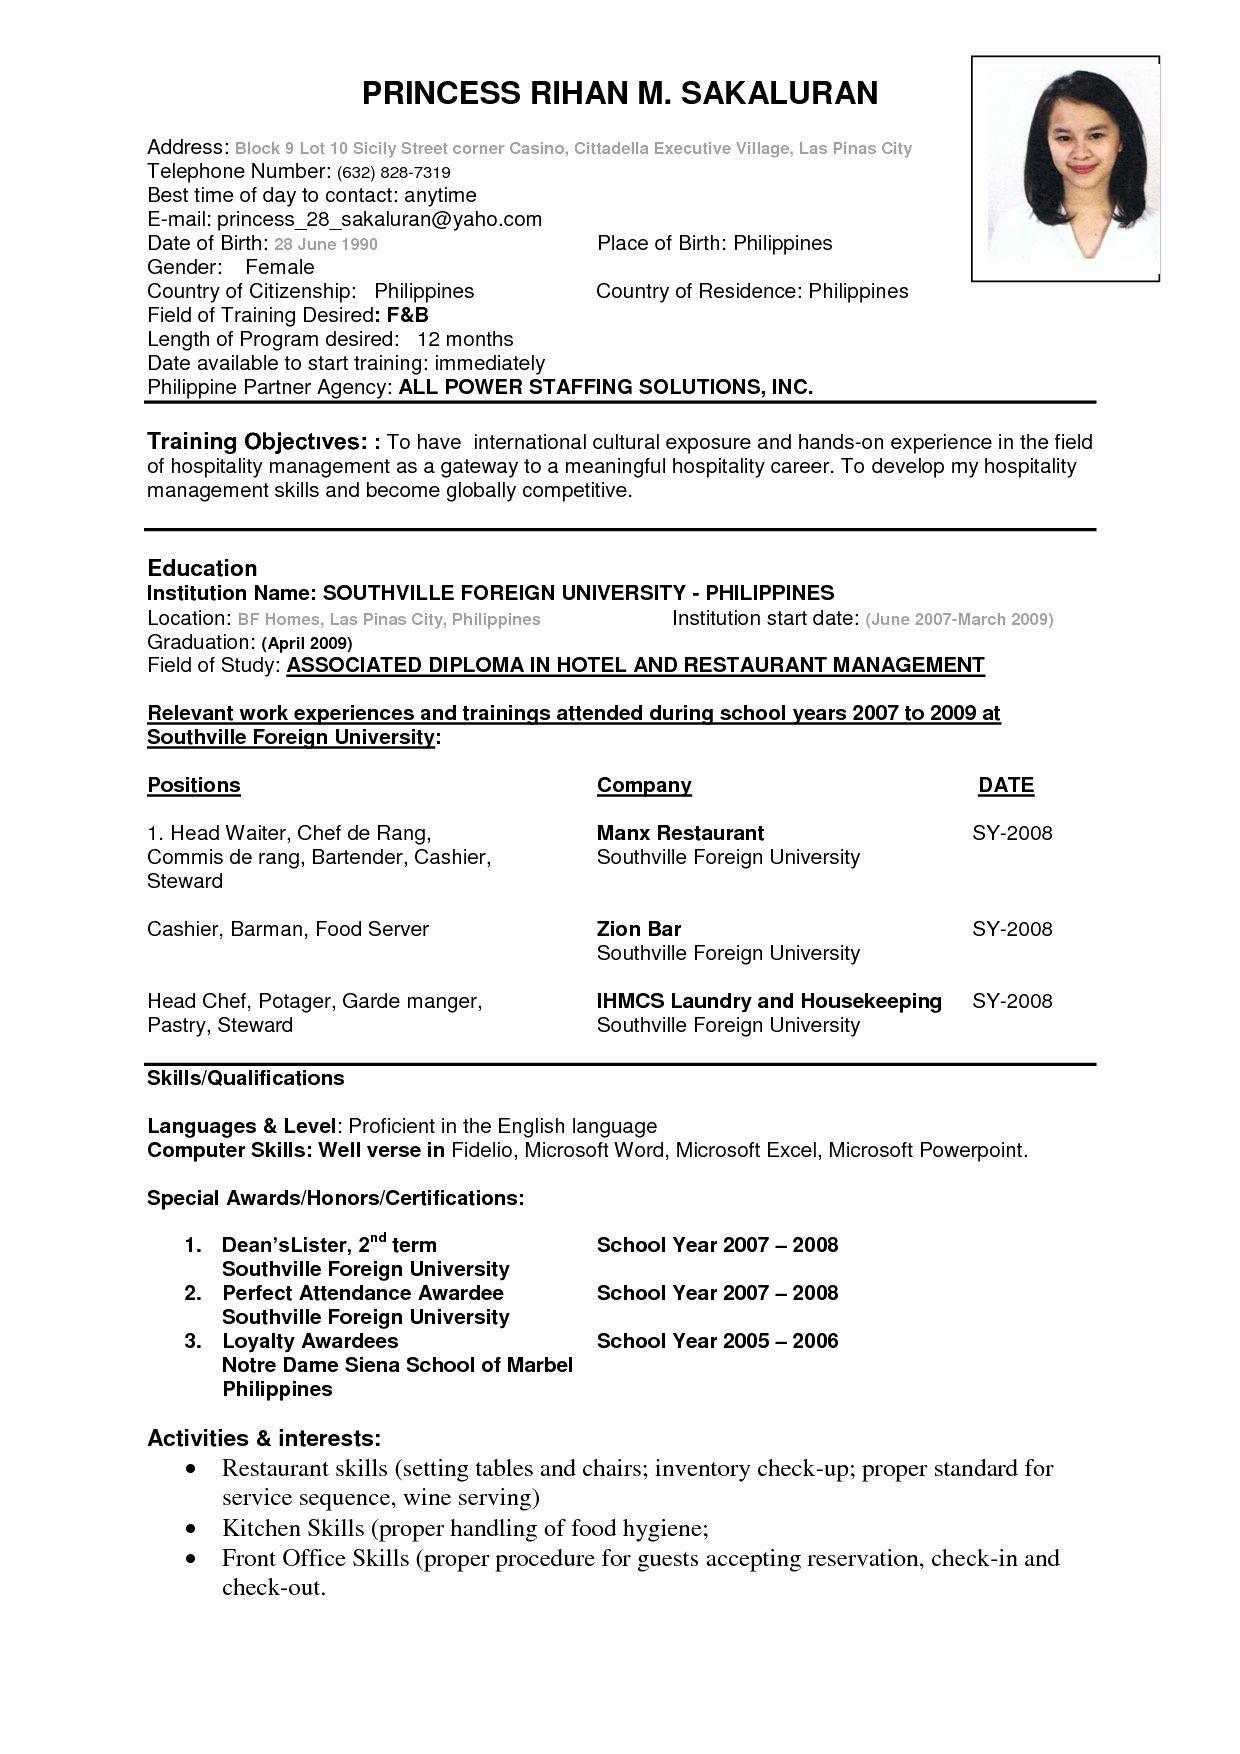 Resume format checker resume format best resume format